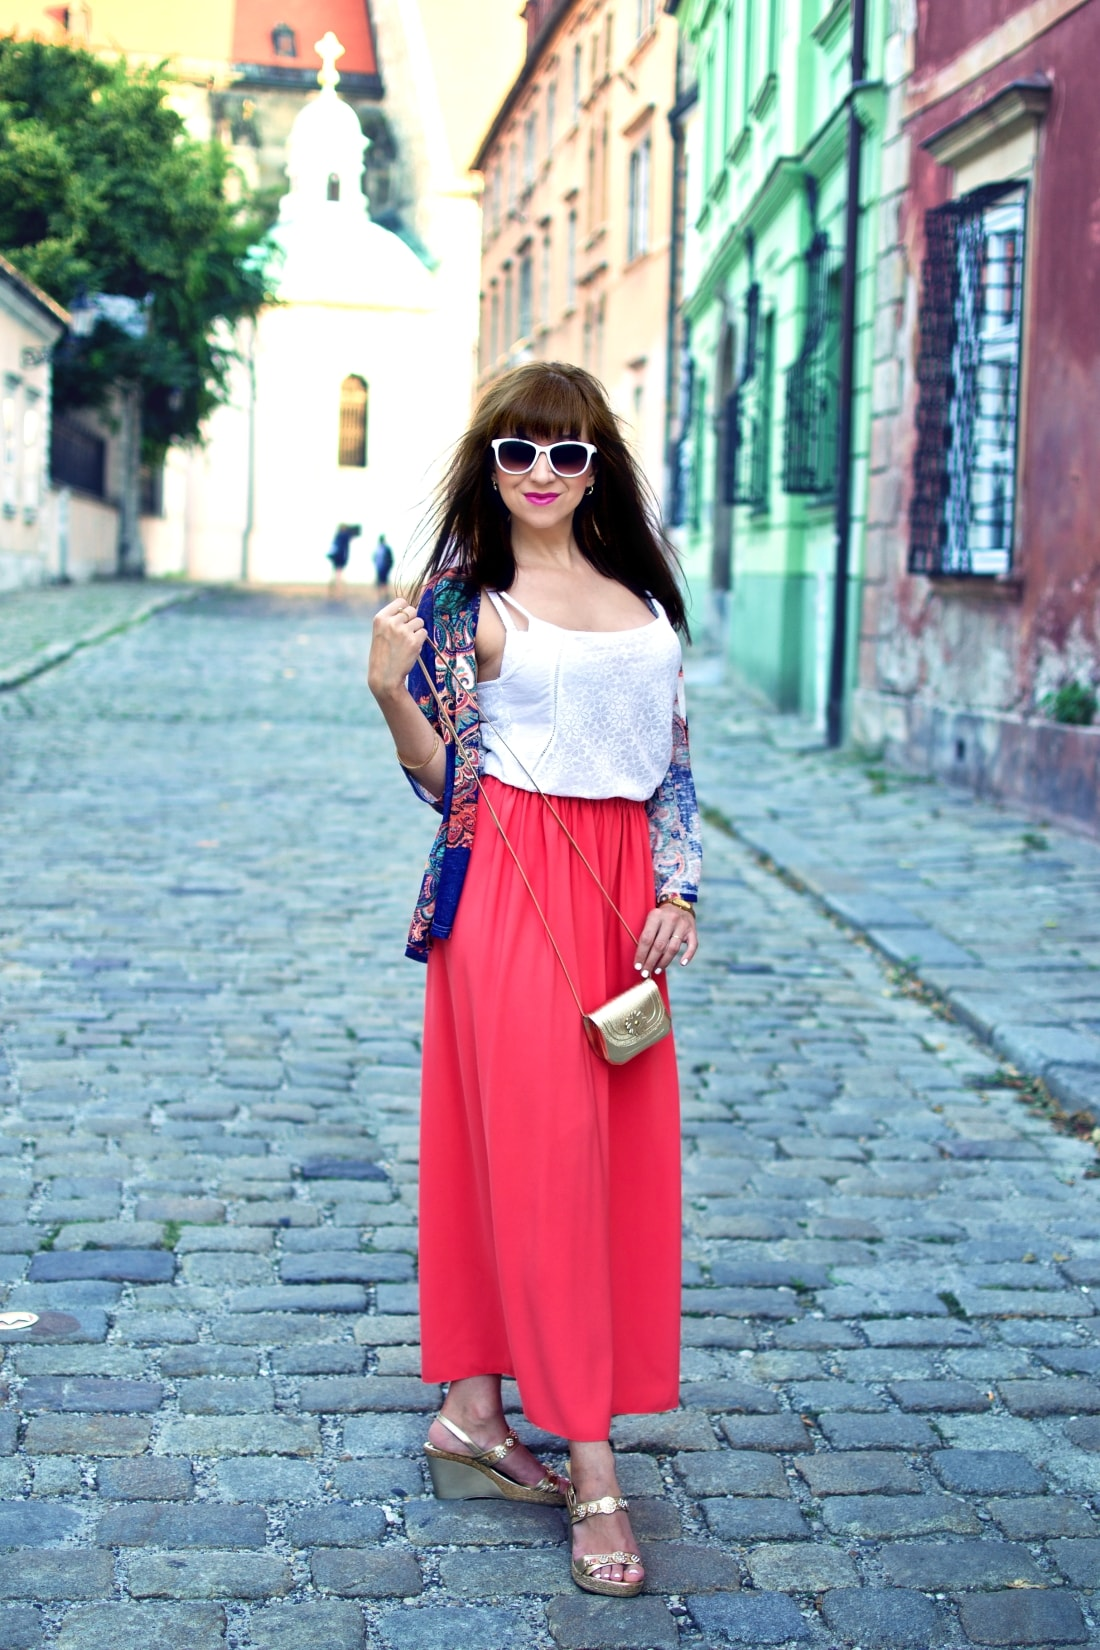 Purse jewel_Katharine fashion is beautiful blog 4_Mini bag_Kimono_Maxi_Handmade_Gold_Katarína Jakubčová_Fashion blogger